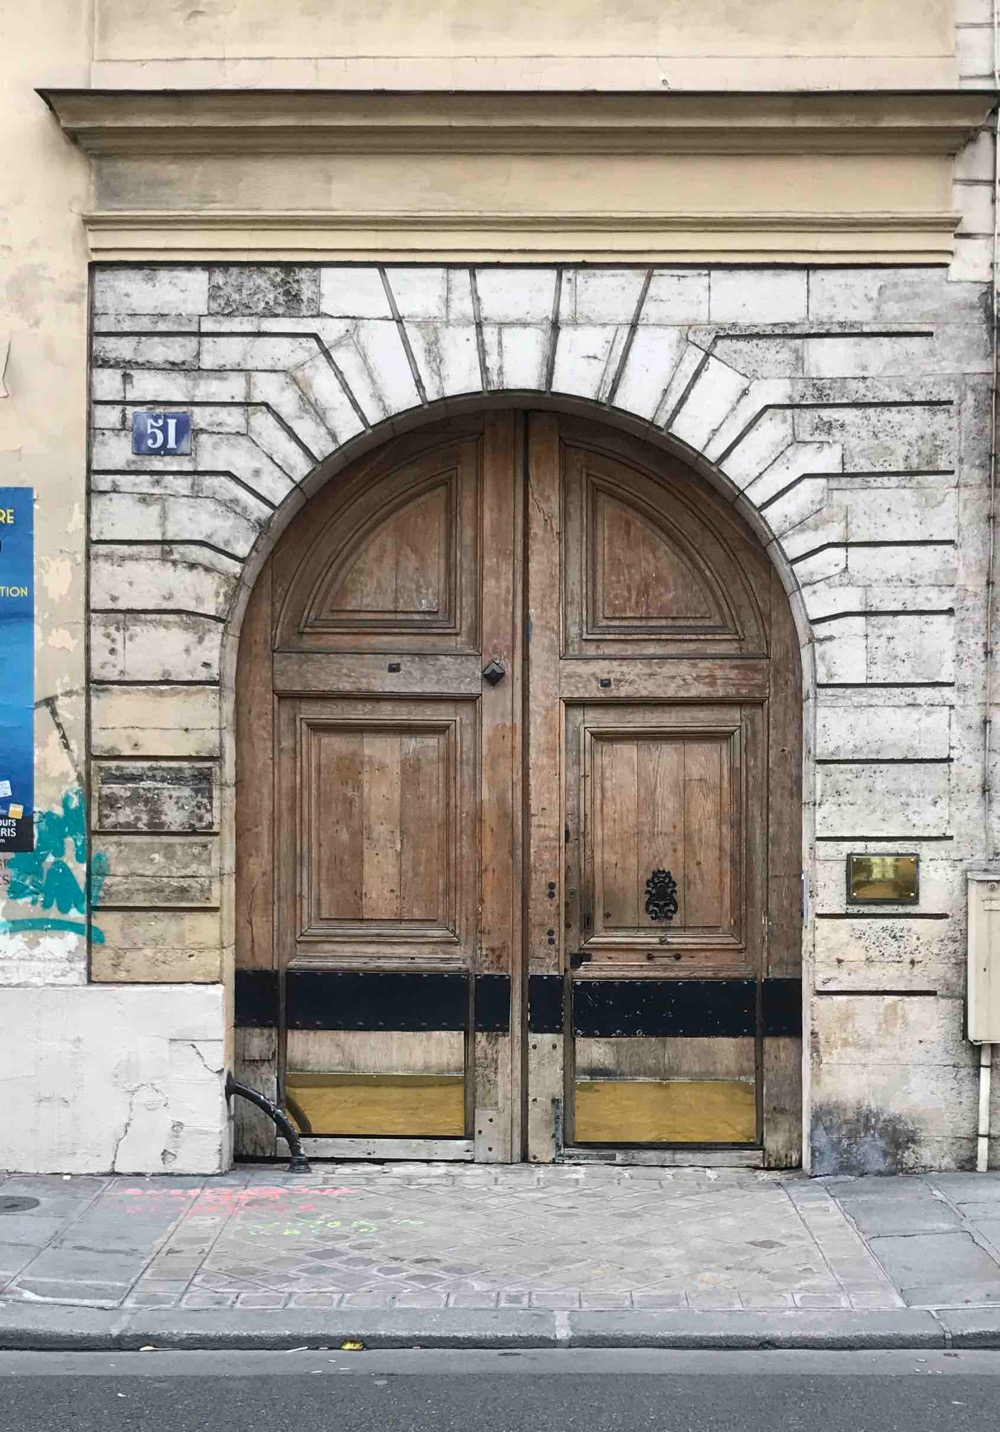 51 Rue De Turennes